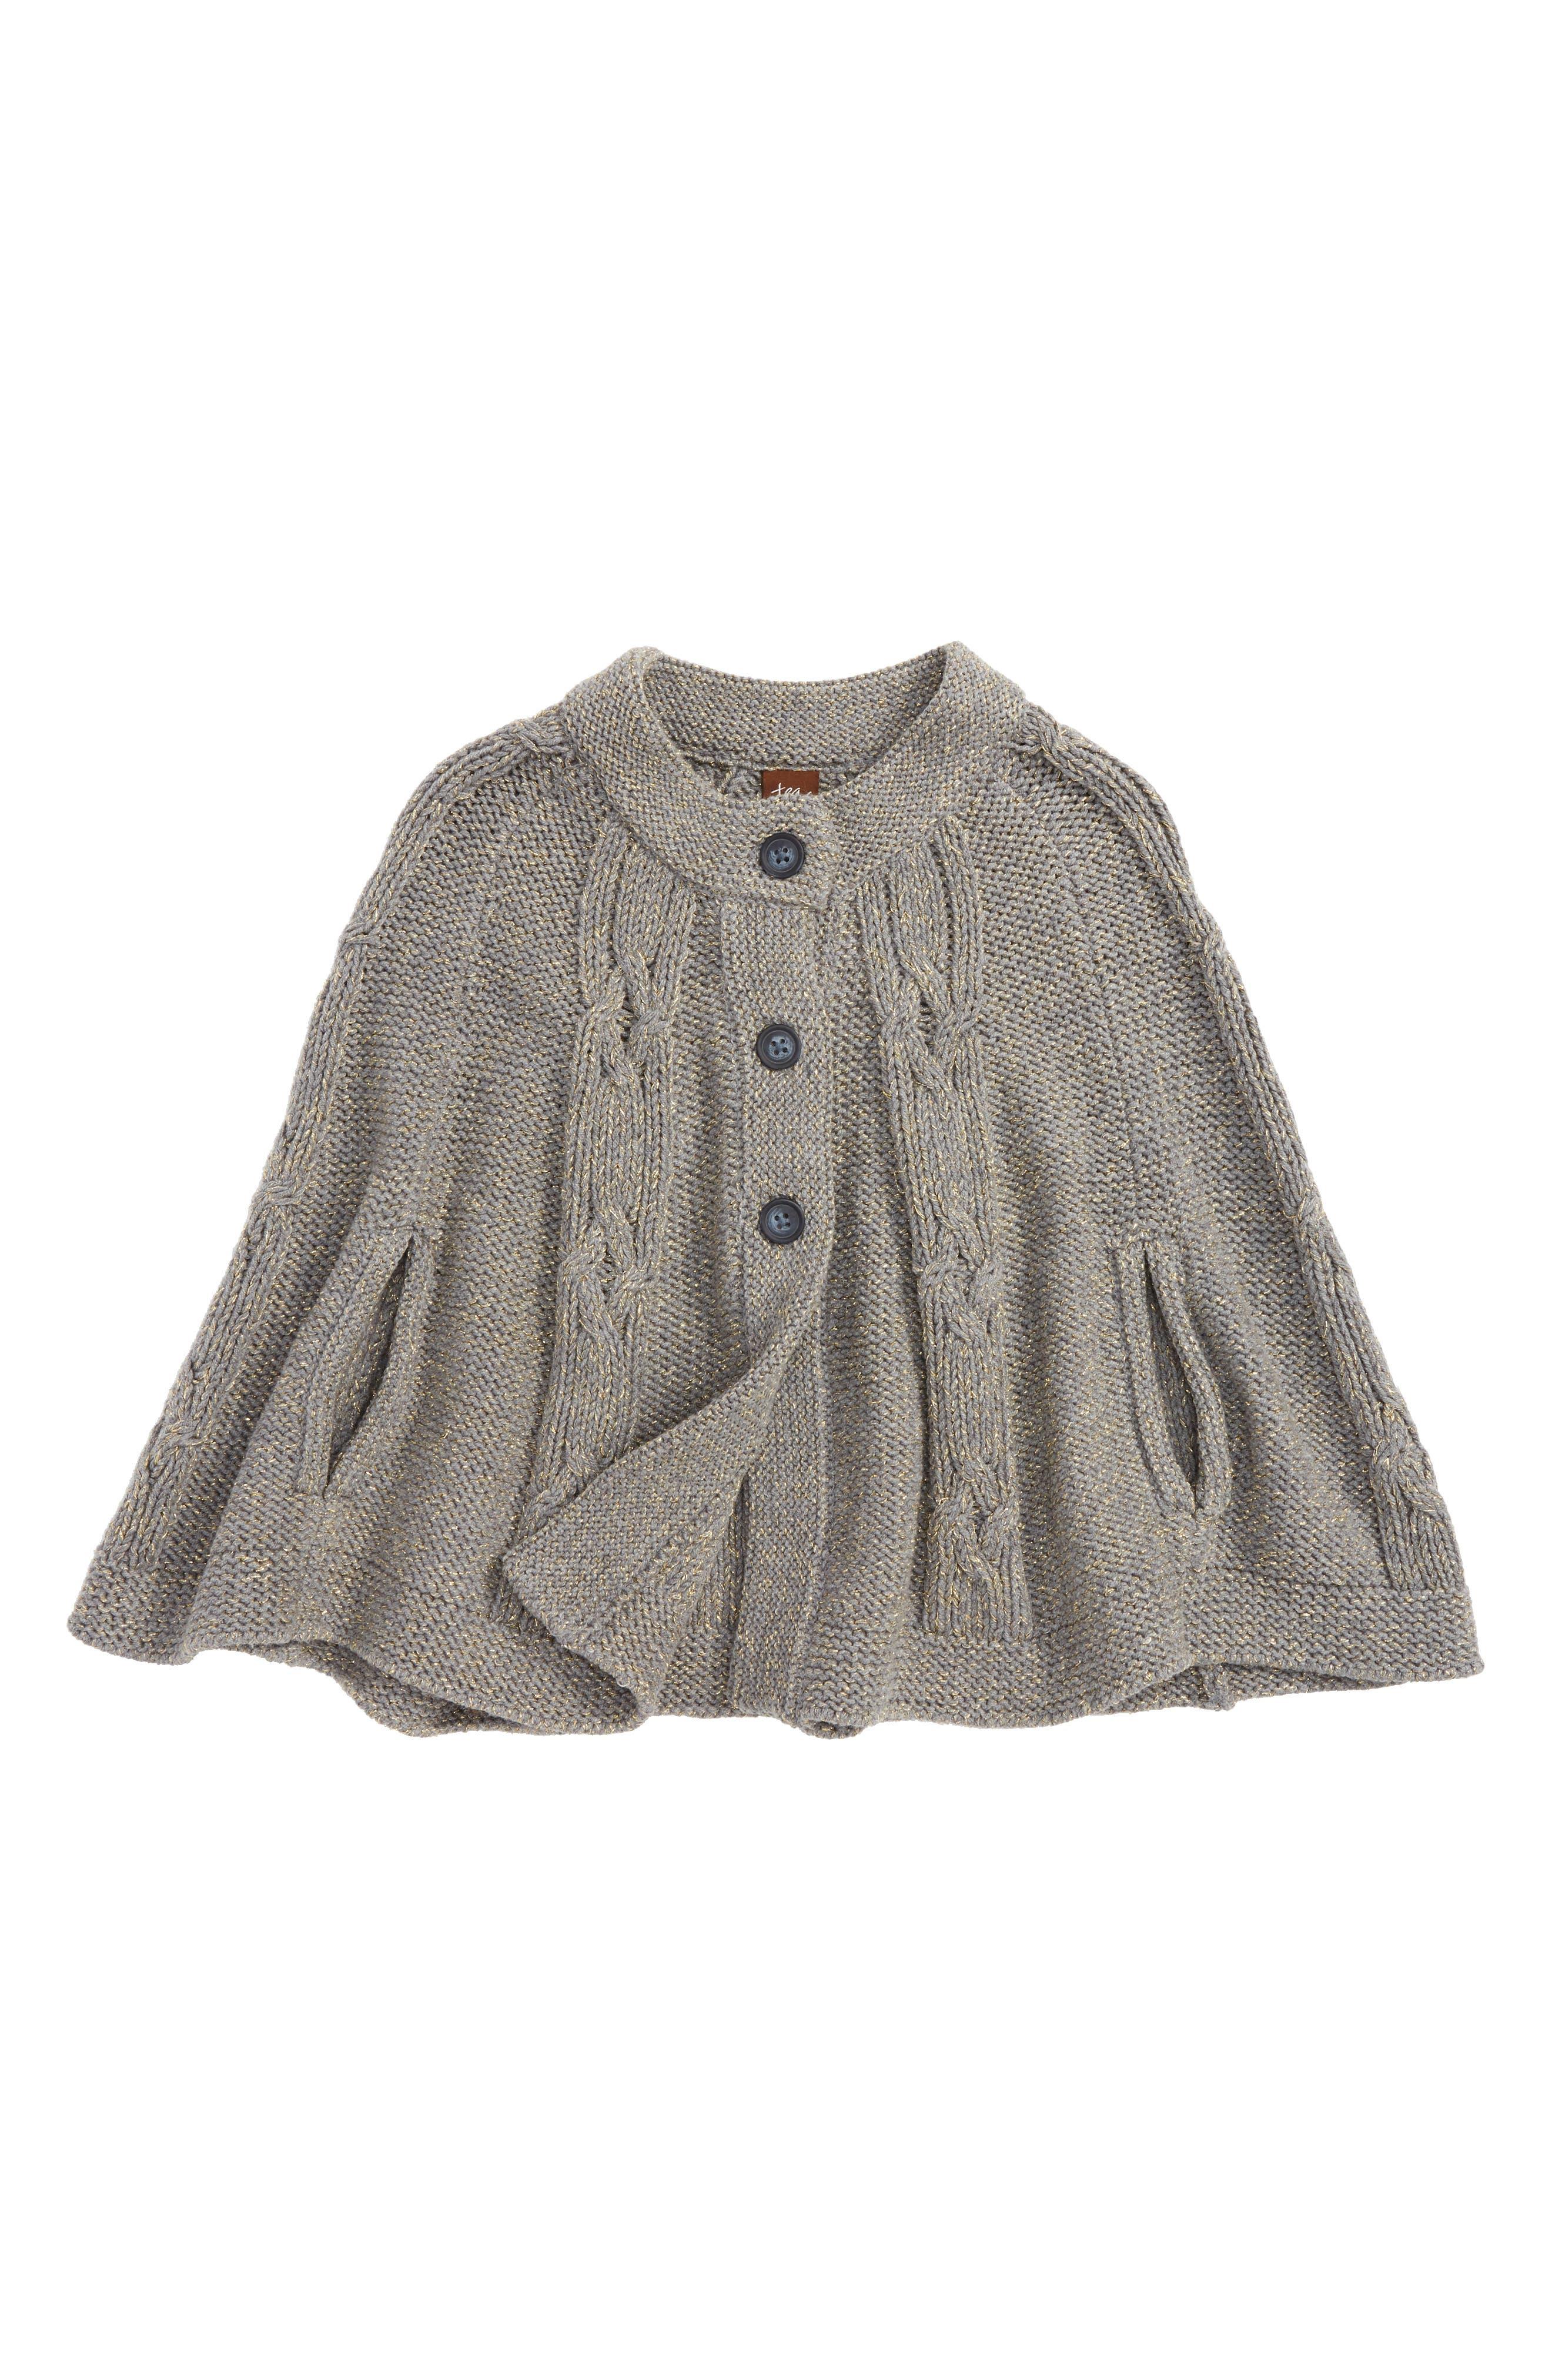 Tea Collection Isobel Sweater Cape (Toddler Girls, Little Girls & Big Girls)